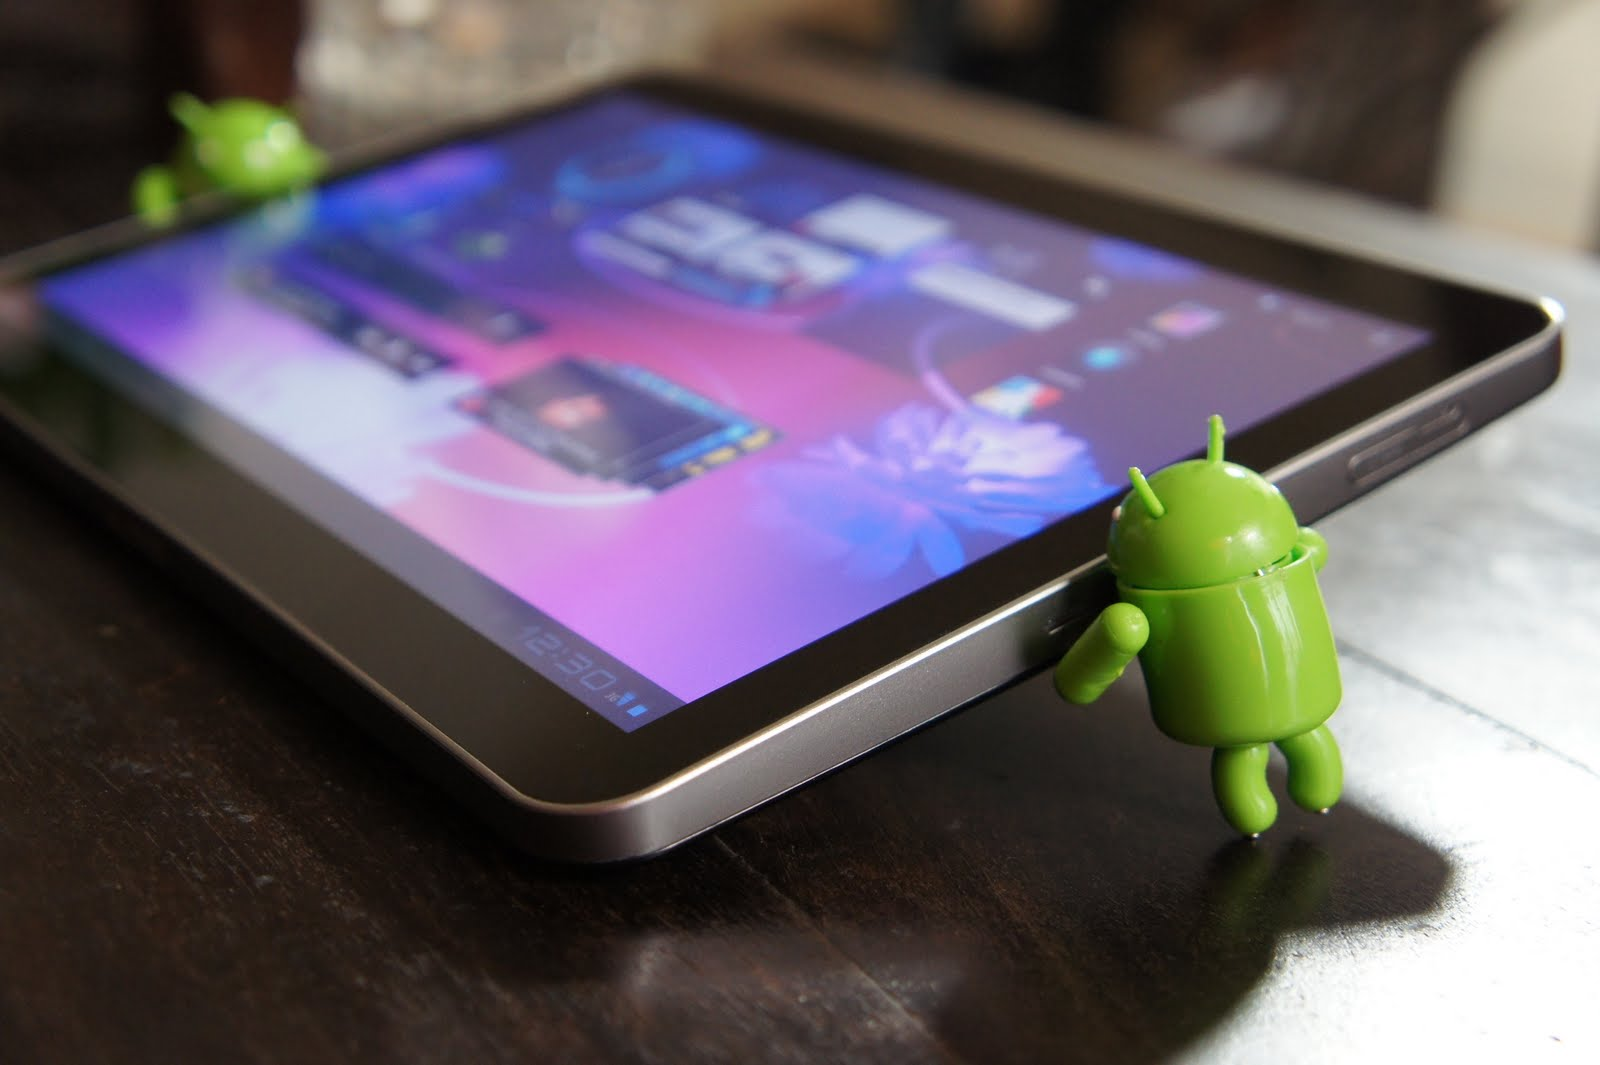 Tab Samsung Galaxy Tab 101 Samsung Galaxy Tab 101 Wallpaper 1600x1065